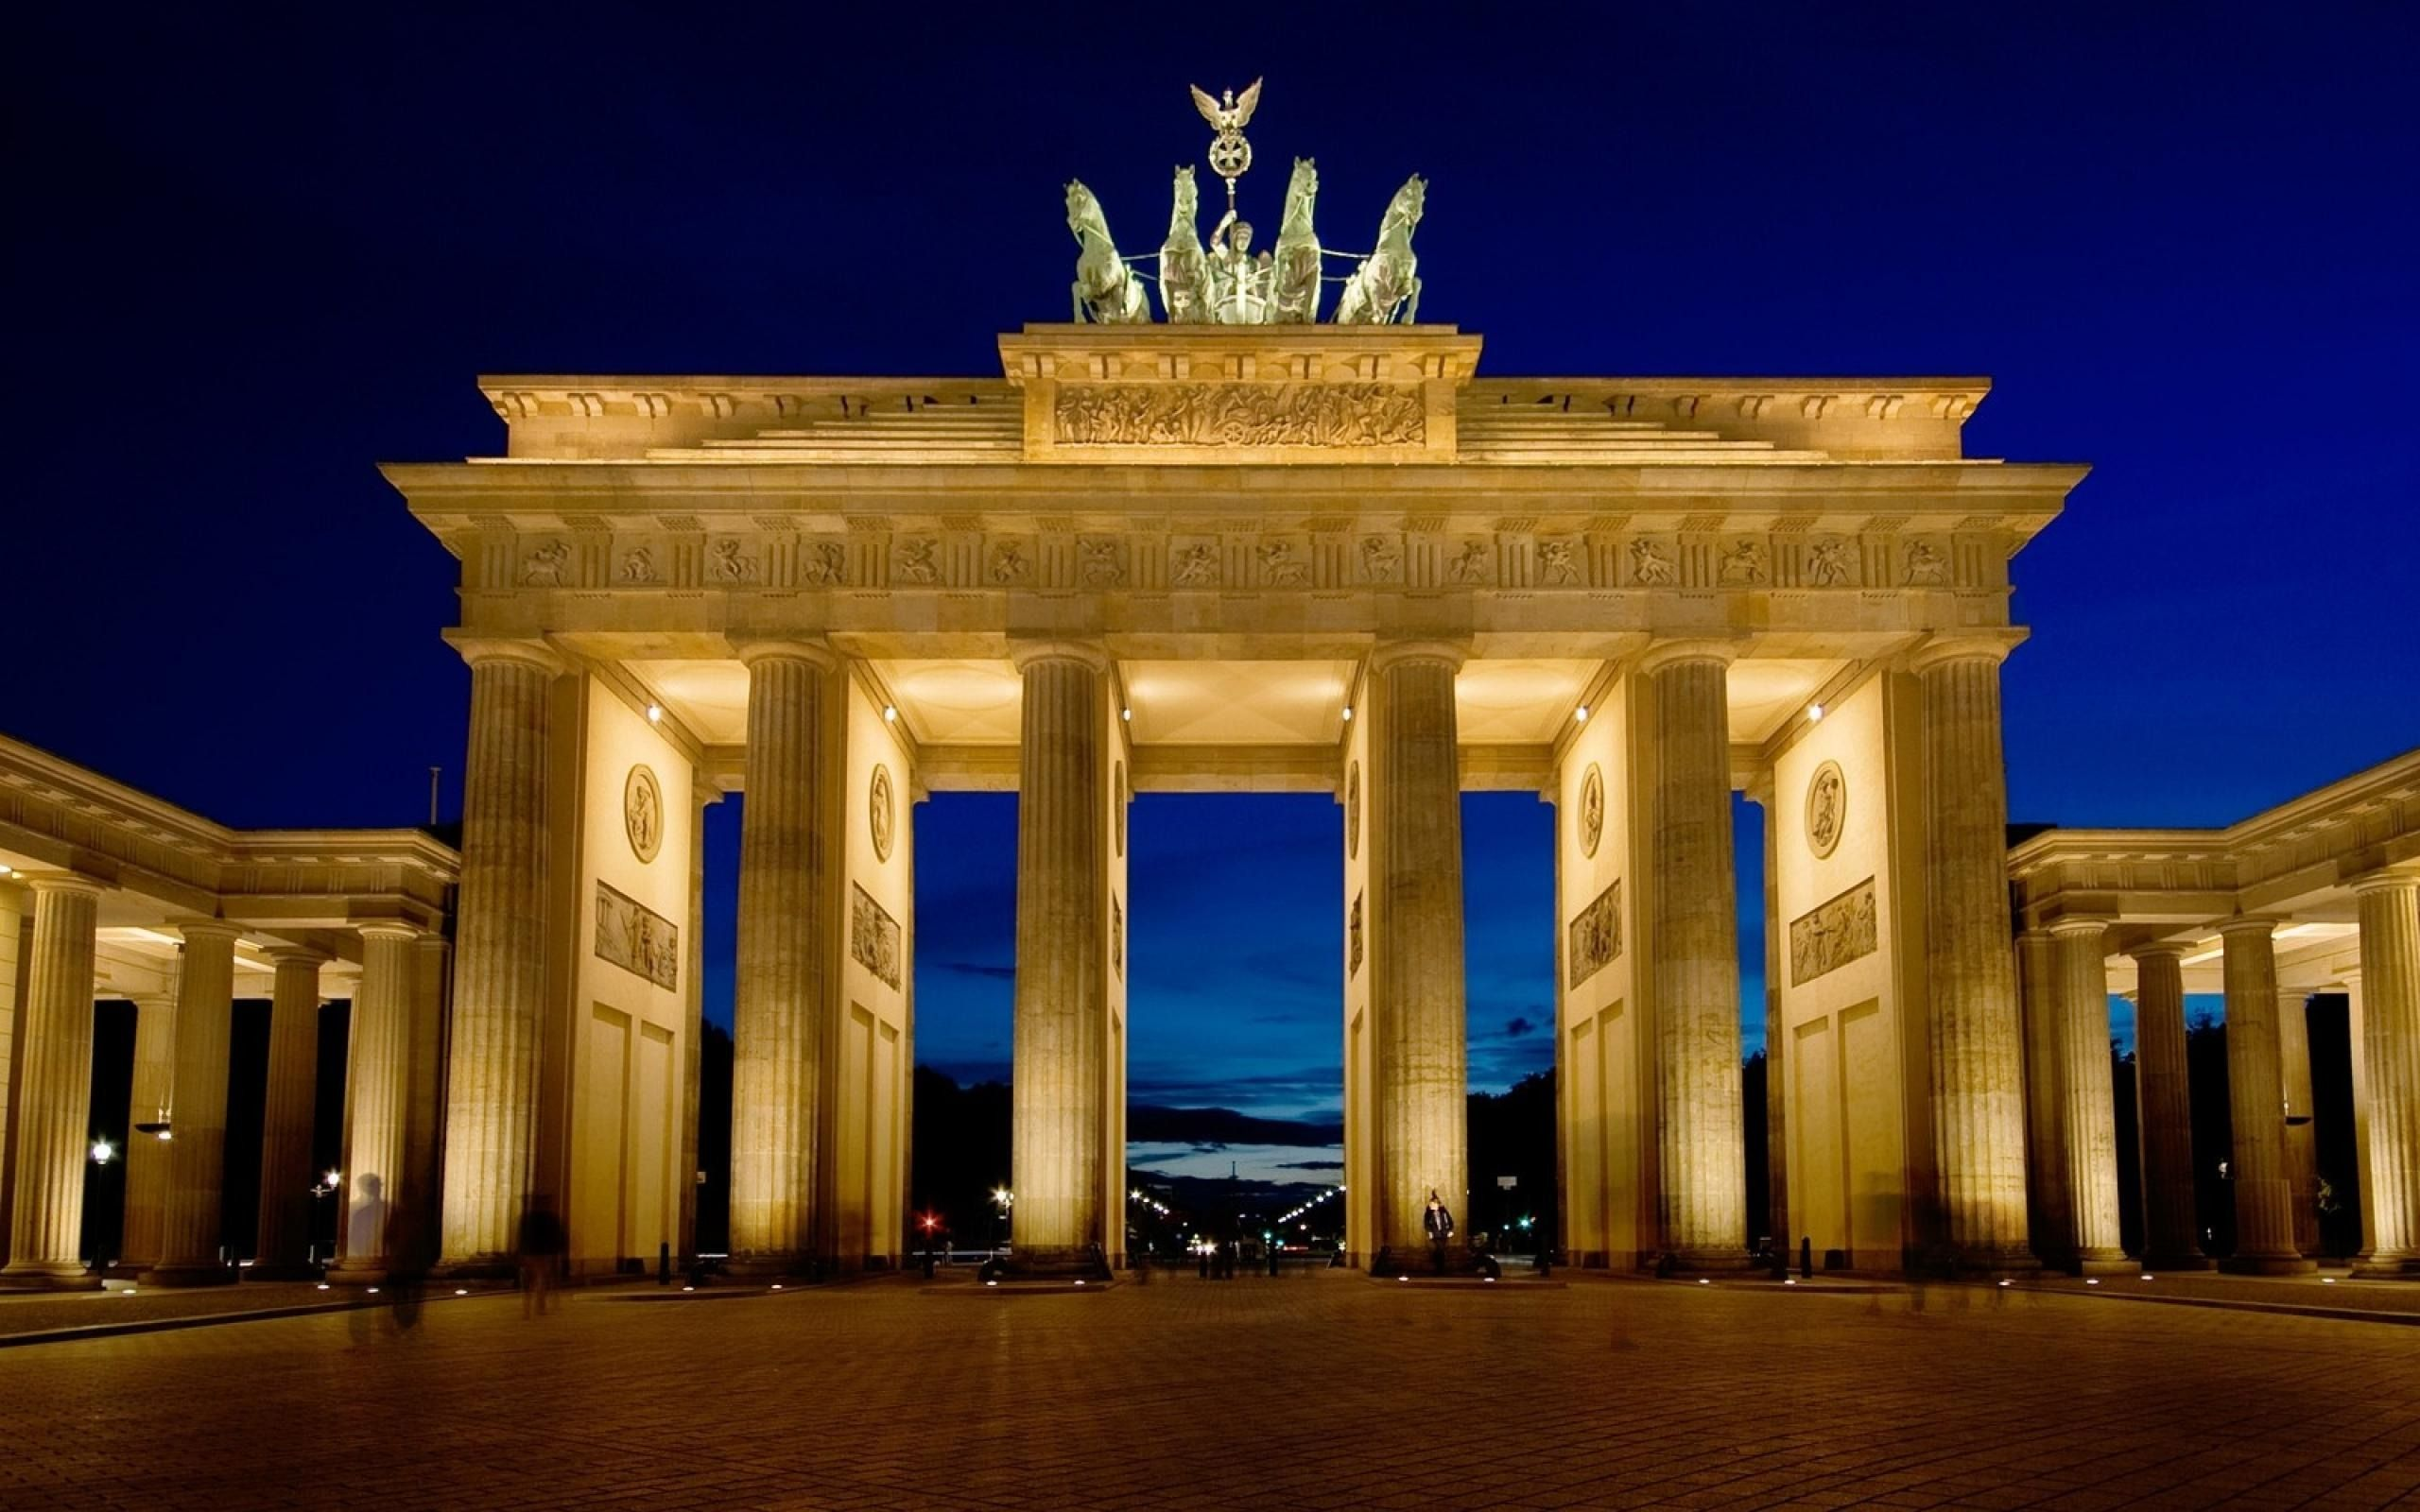 Brandenburg GateBerlin Germany Wallpapers for PC My favorite 2560x1600